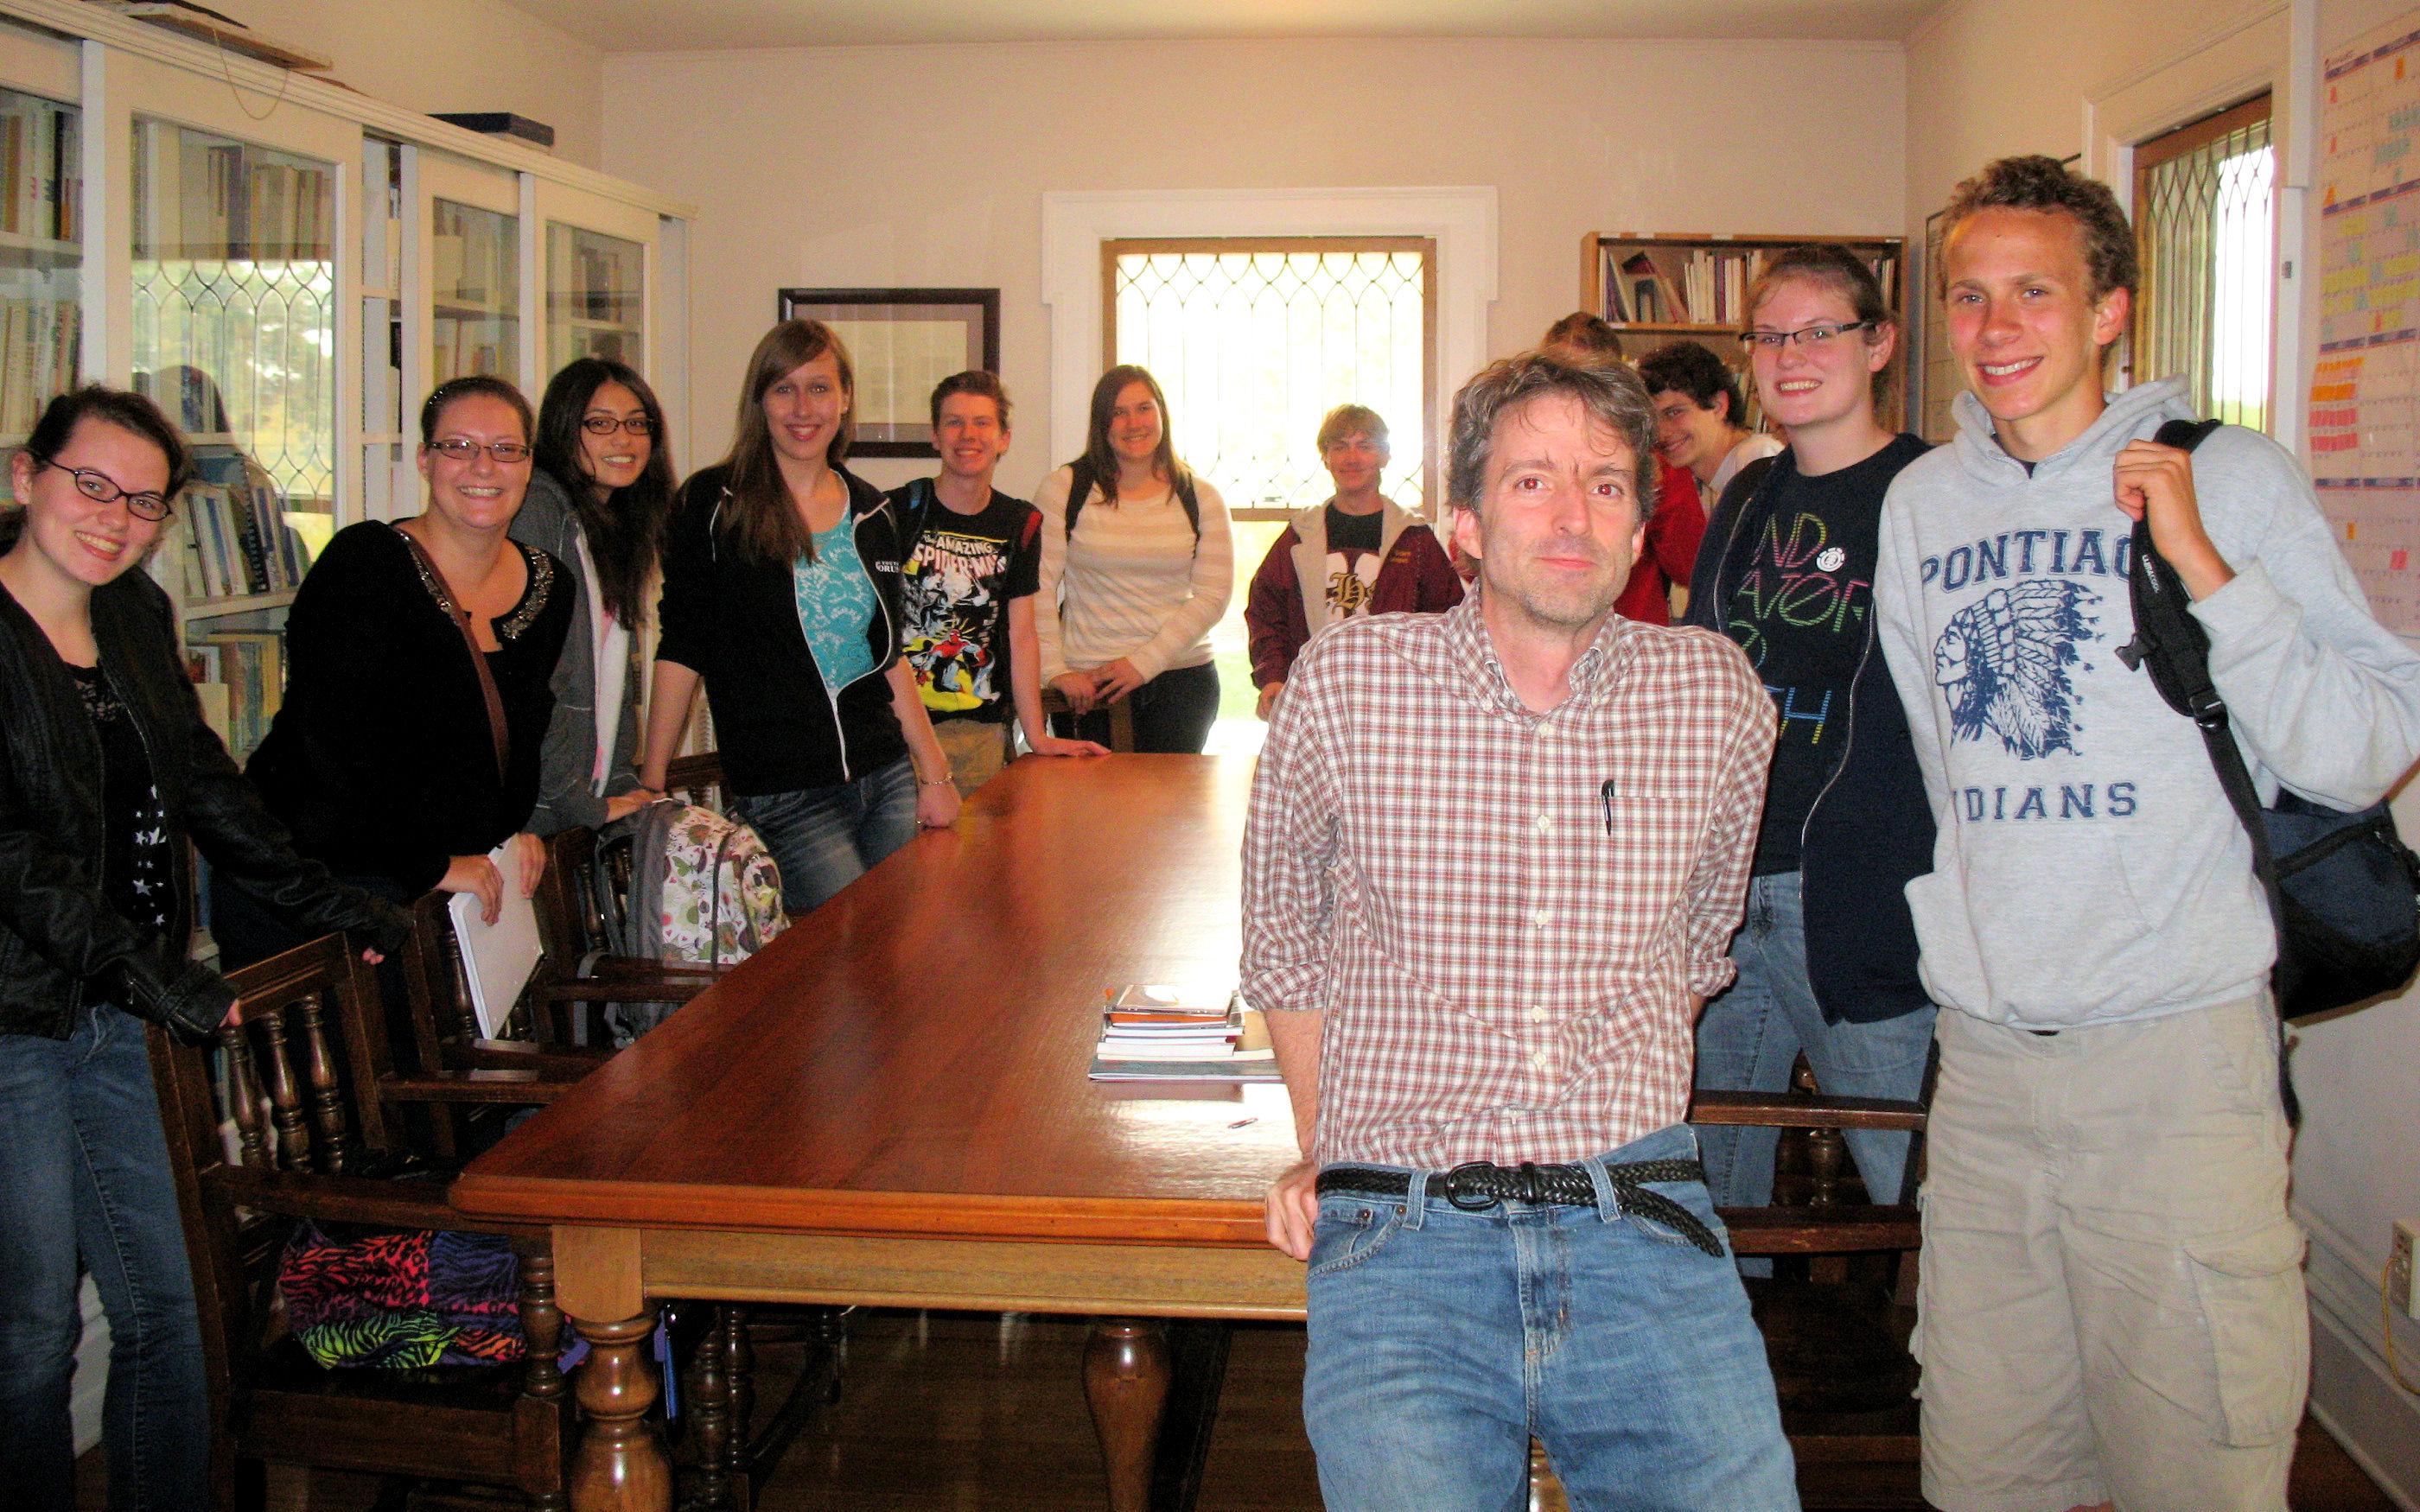 washington's farewell address analysis essay